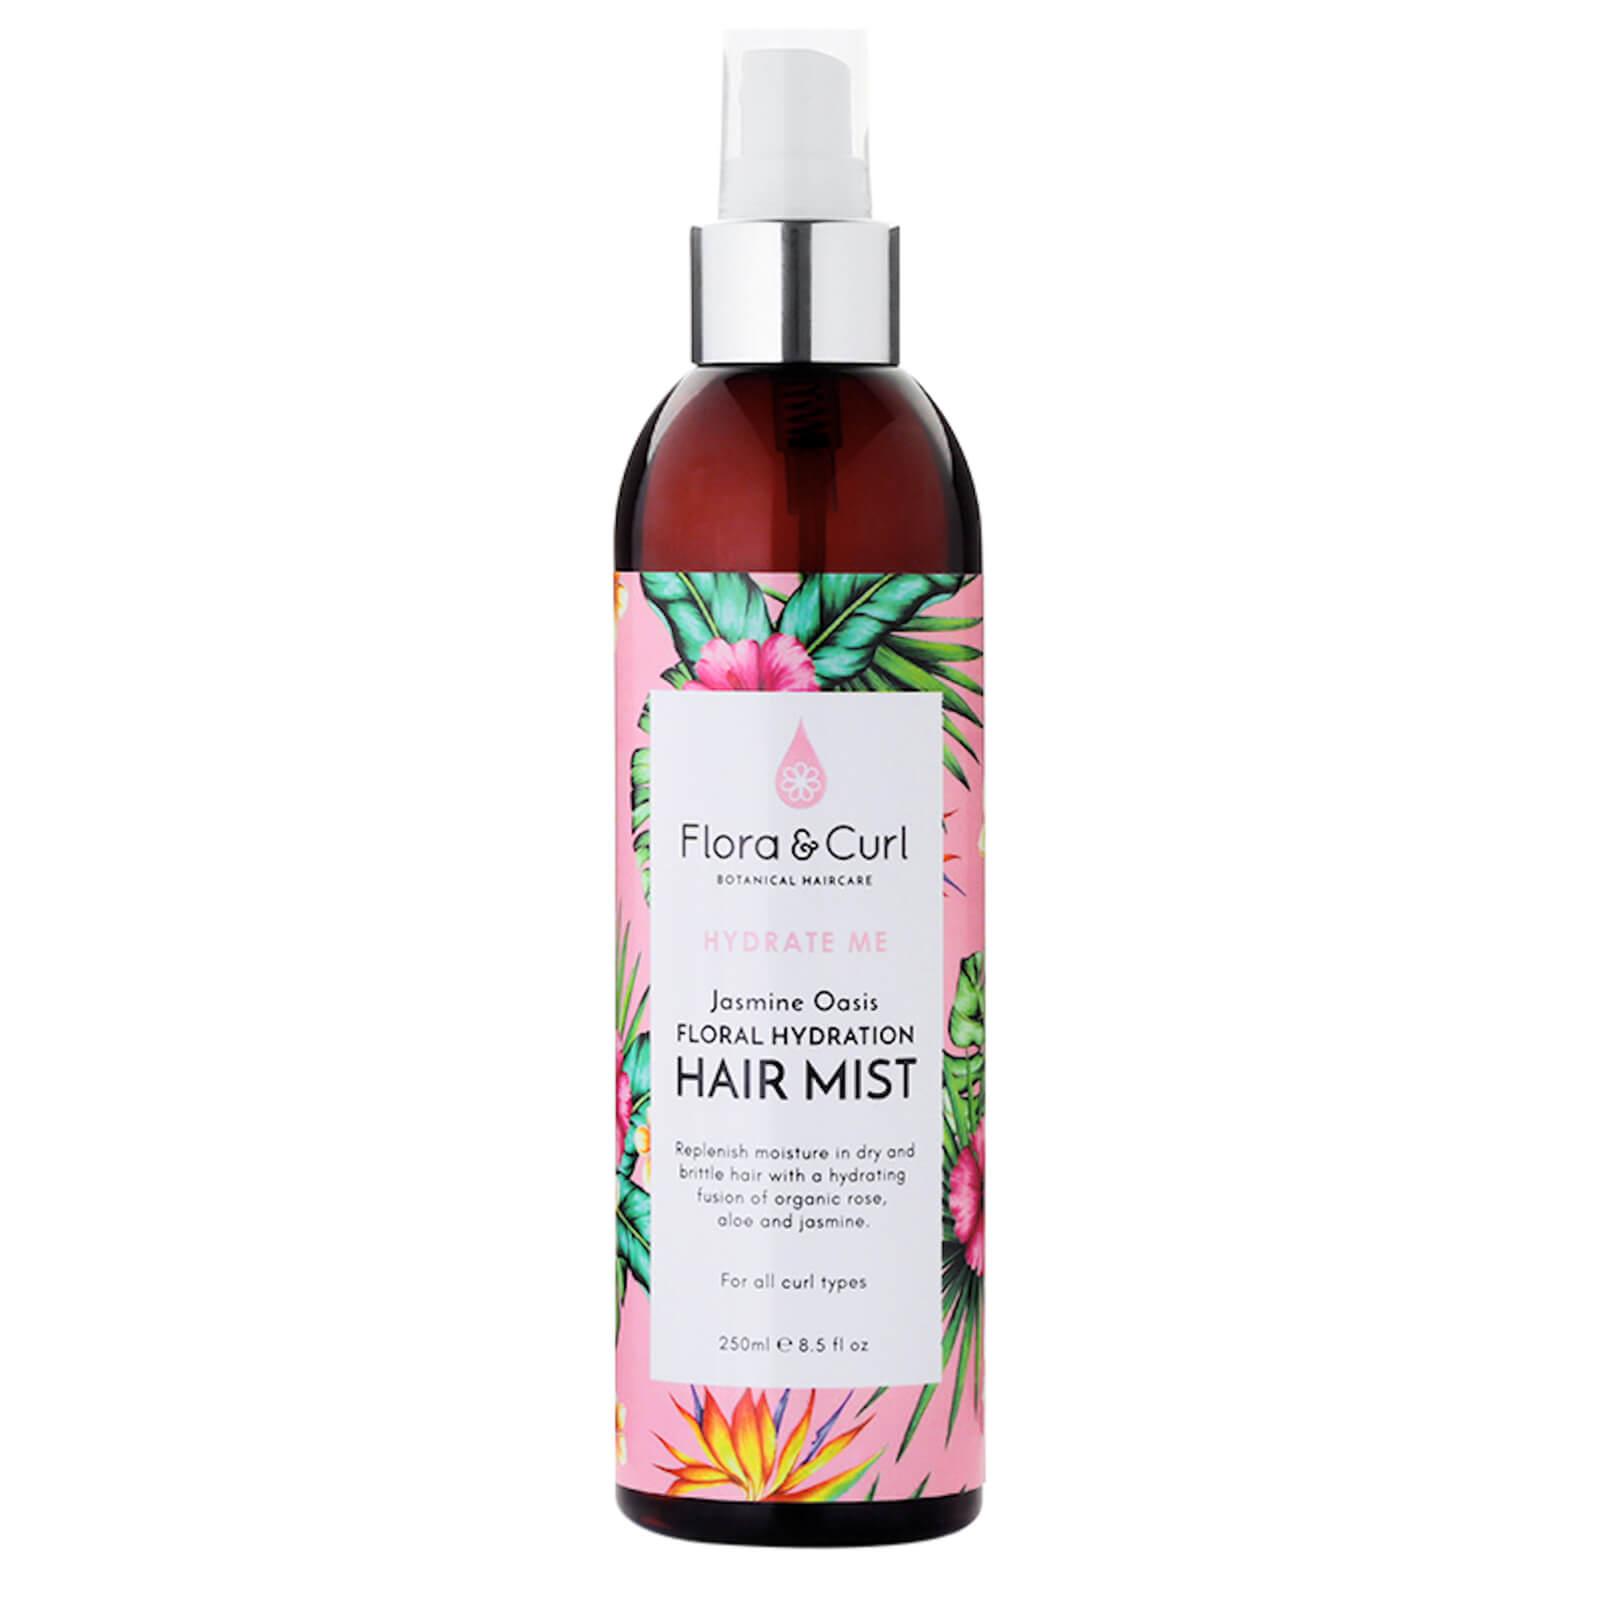 Купить Flora & Curl Jasmine Oasis Hydrating Hair Mist 250ml